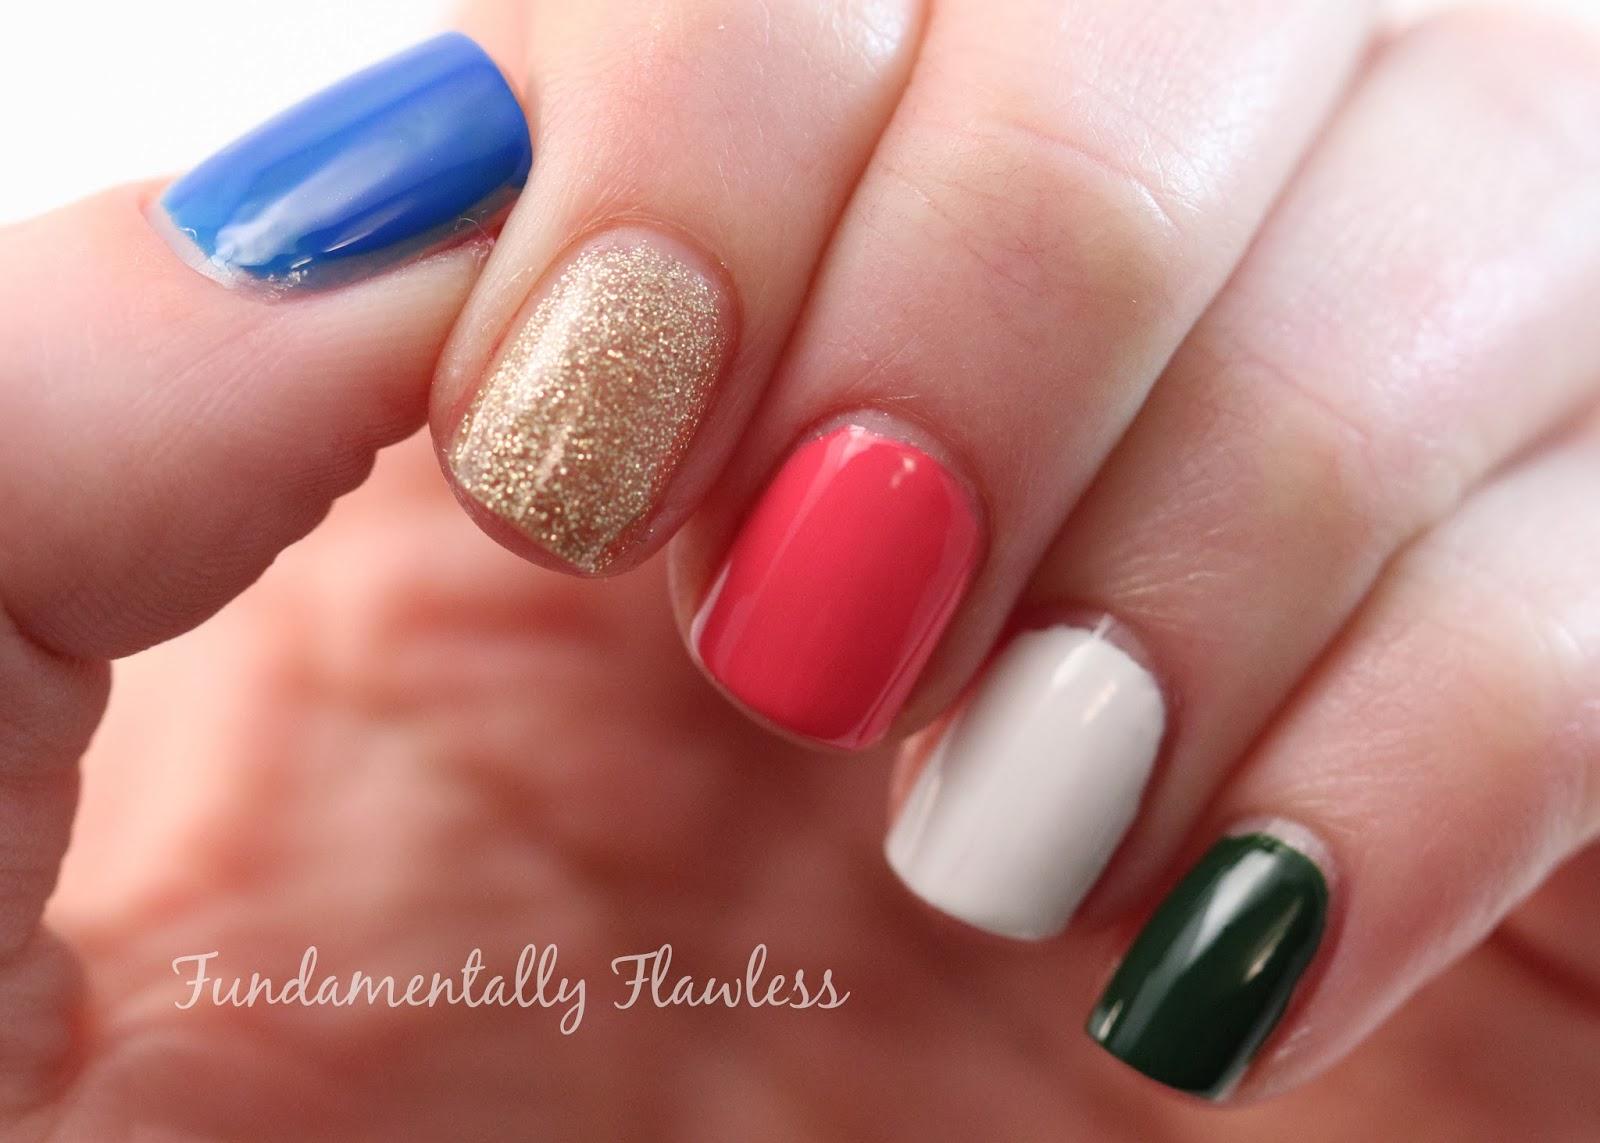 Fundamentally flawless christmas nail art nails supreme plain christmas nail art nails supreme plain nail art kit prinsesfo Gallery